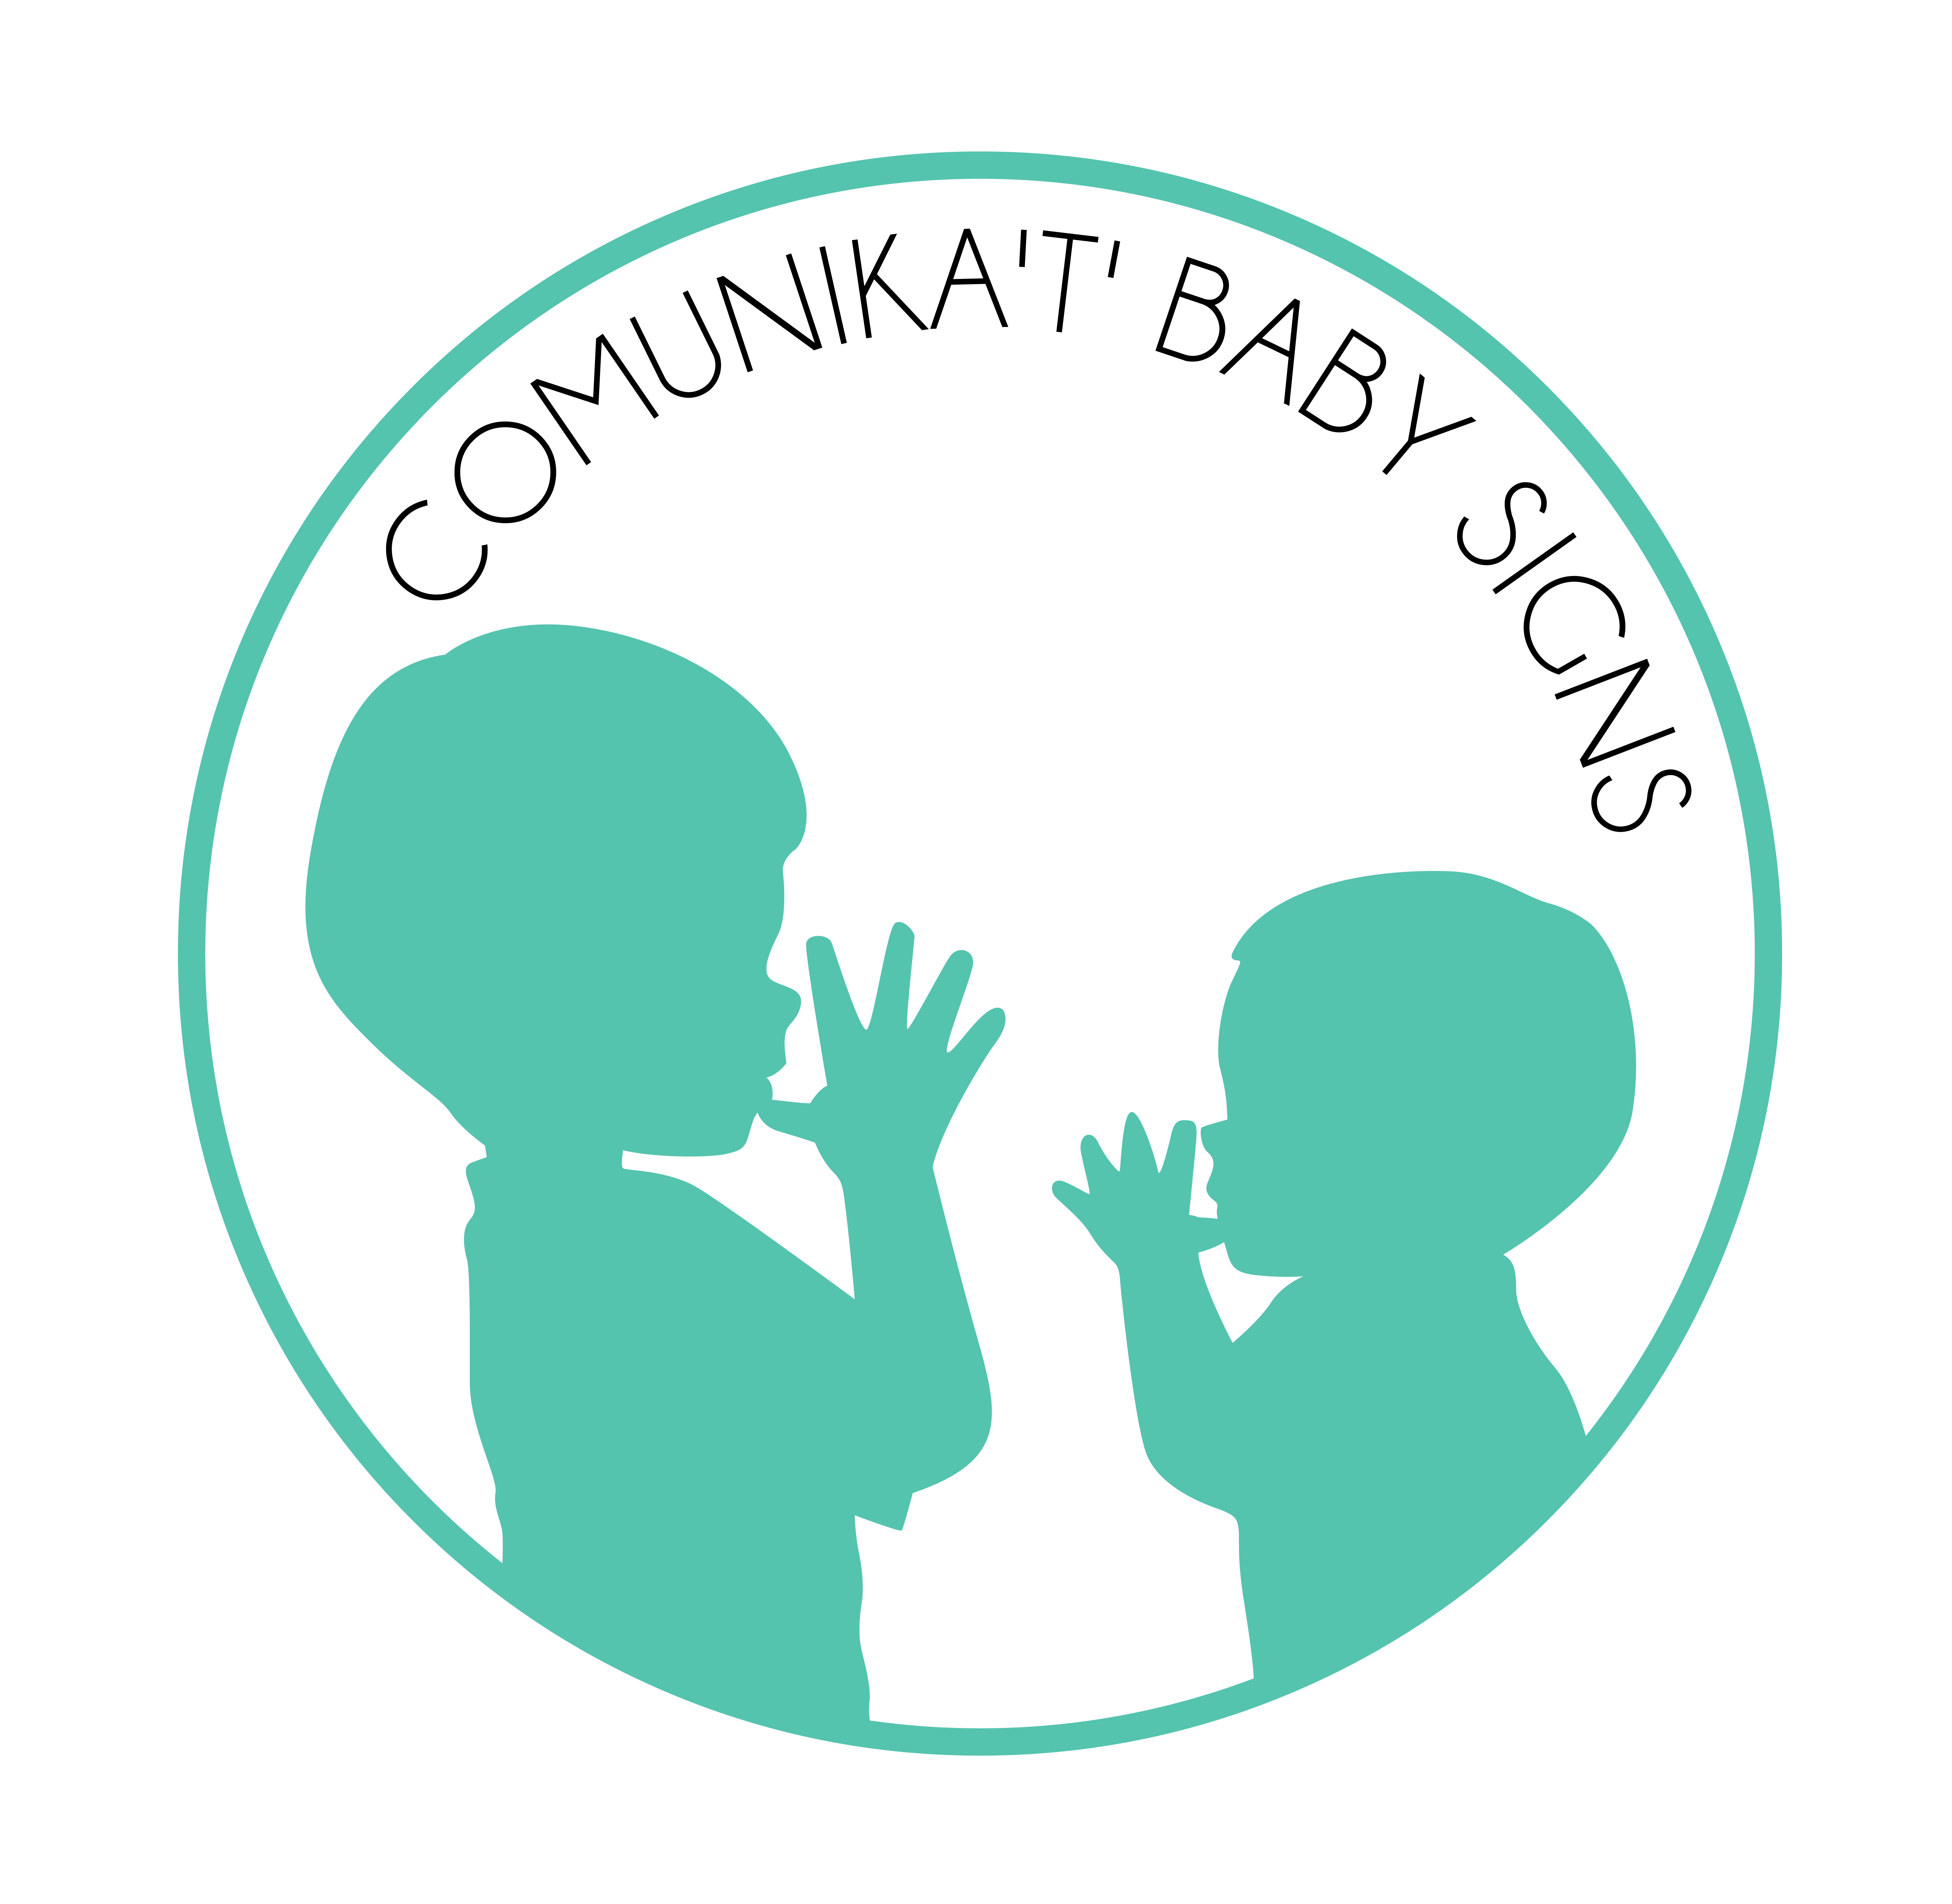 sonia-ferraro-comunikat-babysigns